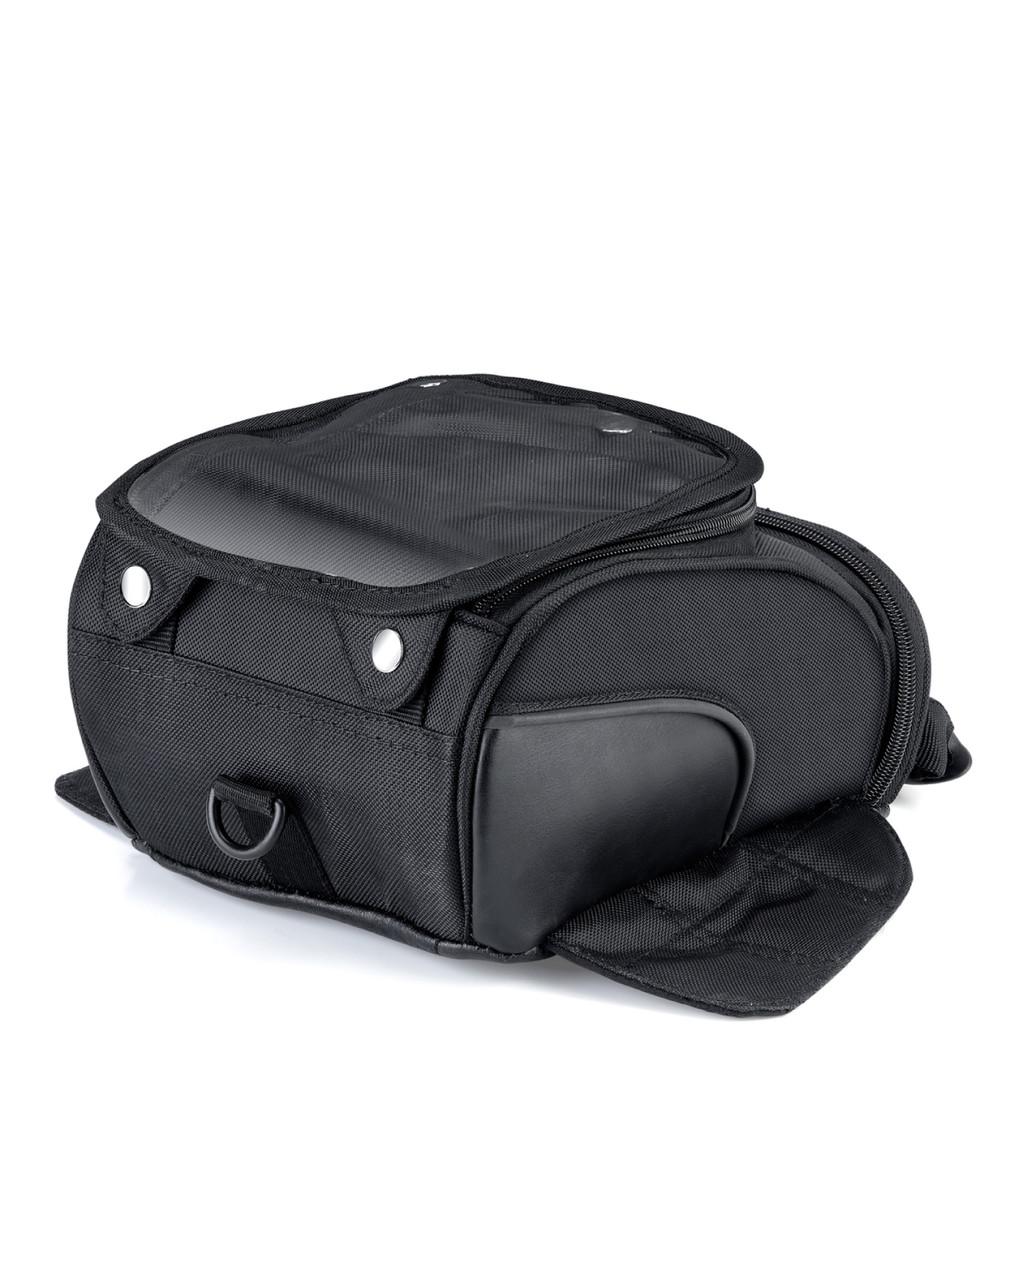 VikingBags 14 Large Magnetic Motorcycle Tank Bag For Harley Davidson Back View